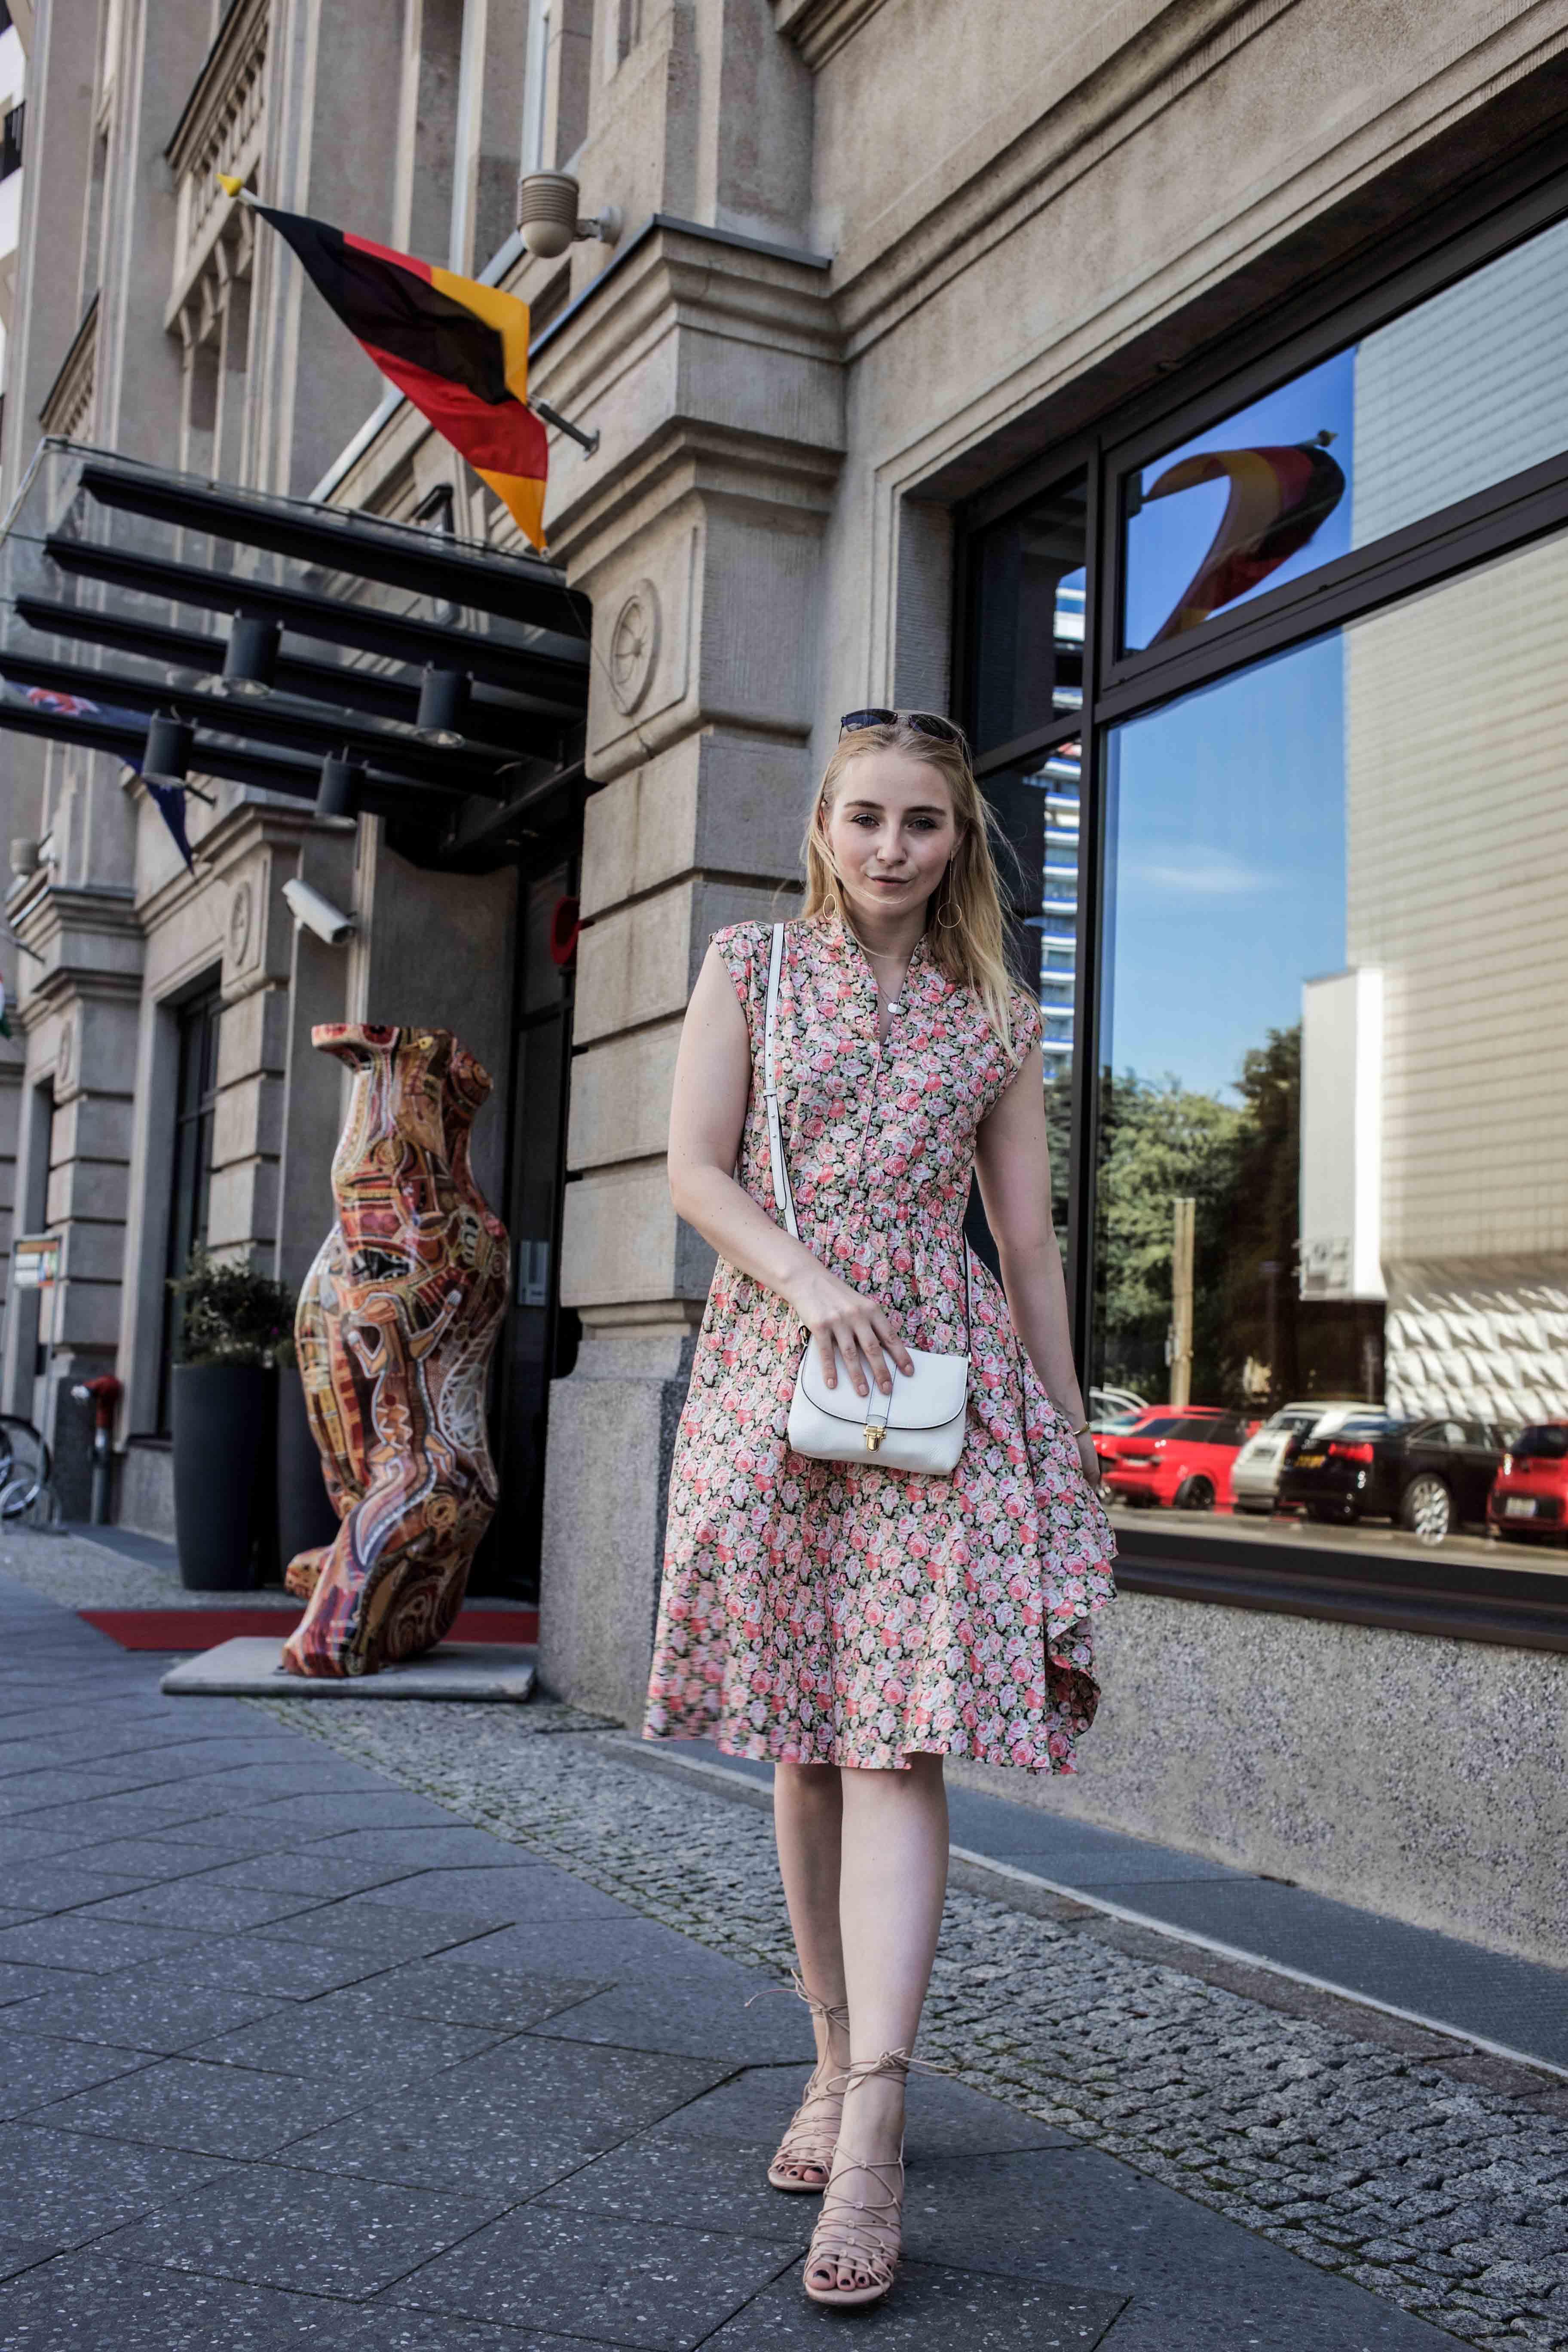 80er-jahre-blumenkleid-paris-vintage-lover-second-hand-outfit-look-fashionblogger-modeblog_7736